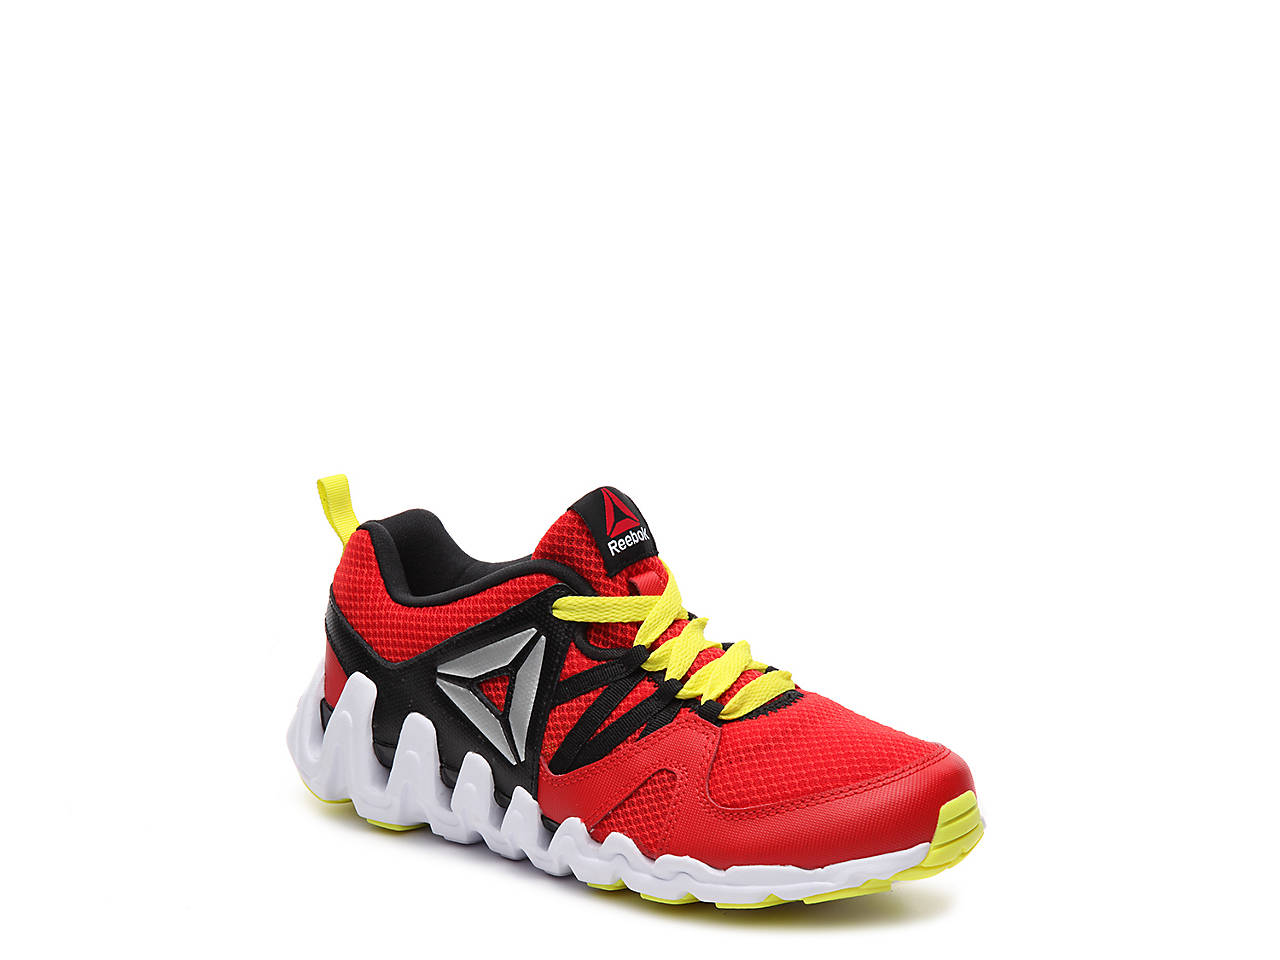 6feaa0a662e2 Reebok Zig Big N  Fast Fire Youth Running Shoe Kids Shoes